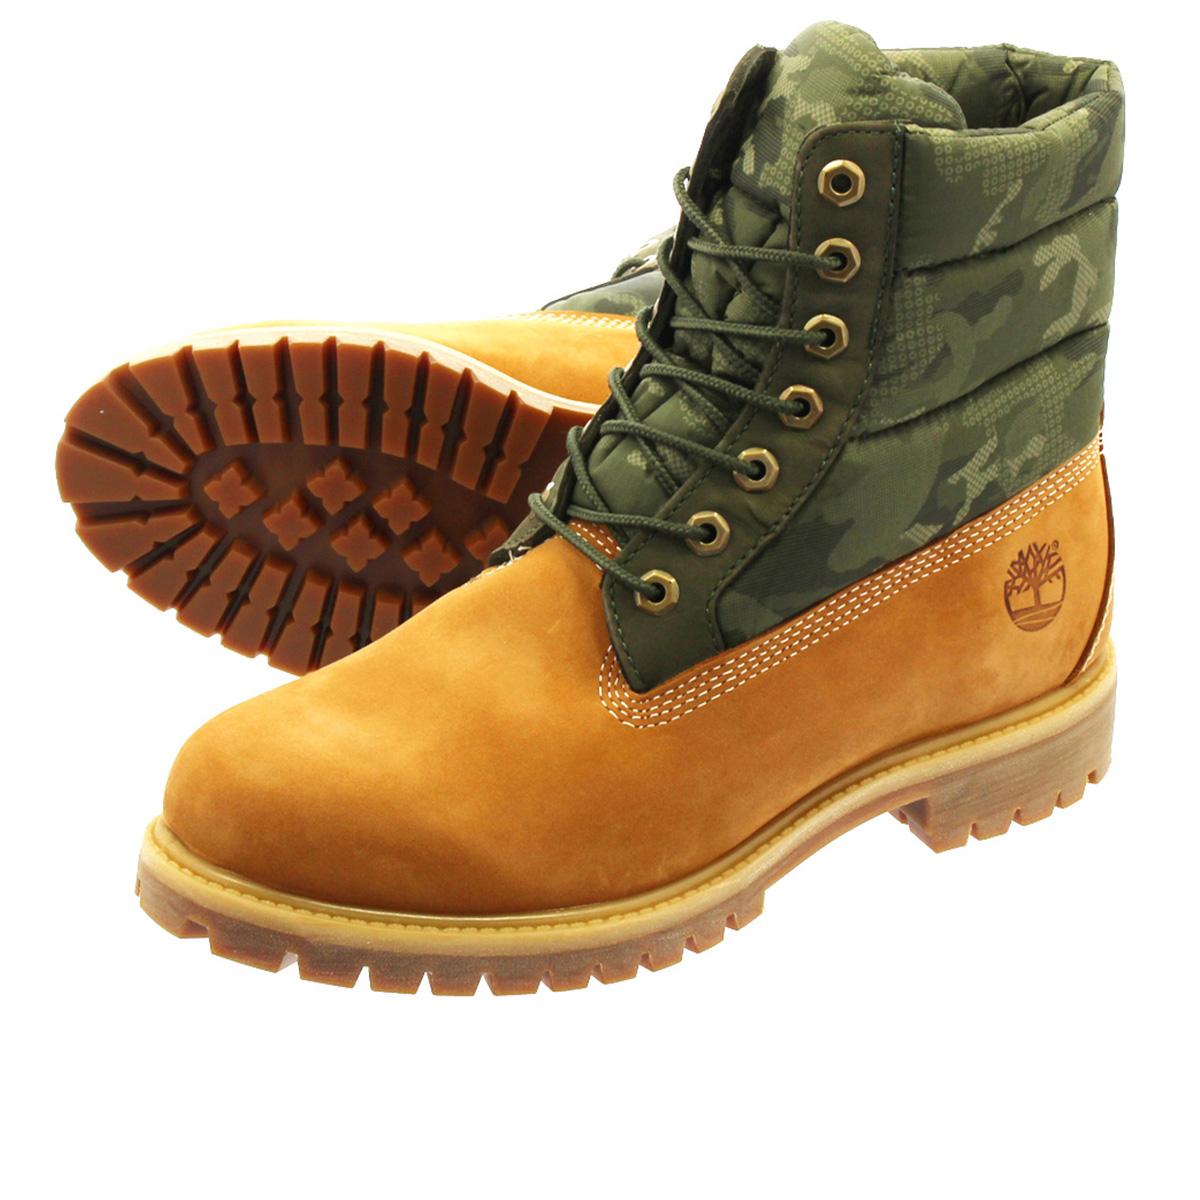 fd1ec054077 6 inches of TIMBERLAND 6inch PREMIUM PUFFER BOOTS Timberland premium boots  WHEAT NUBACK a1zrh